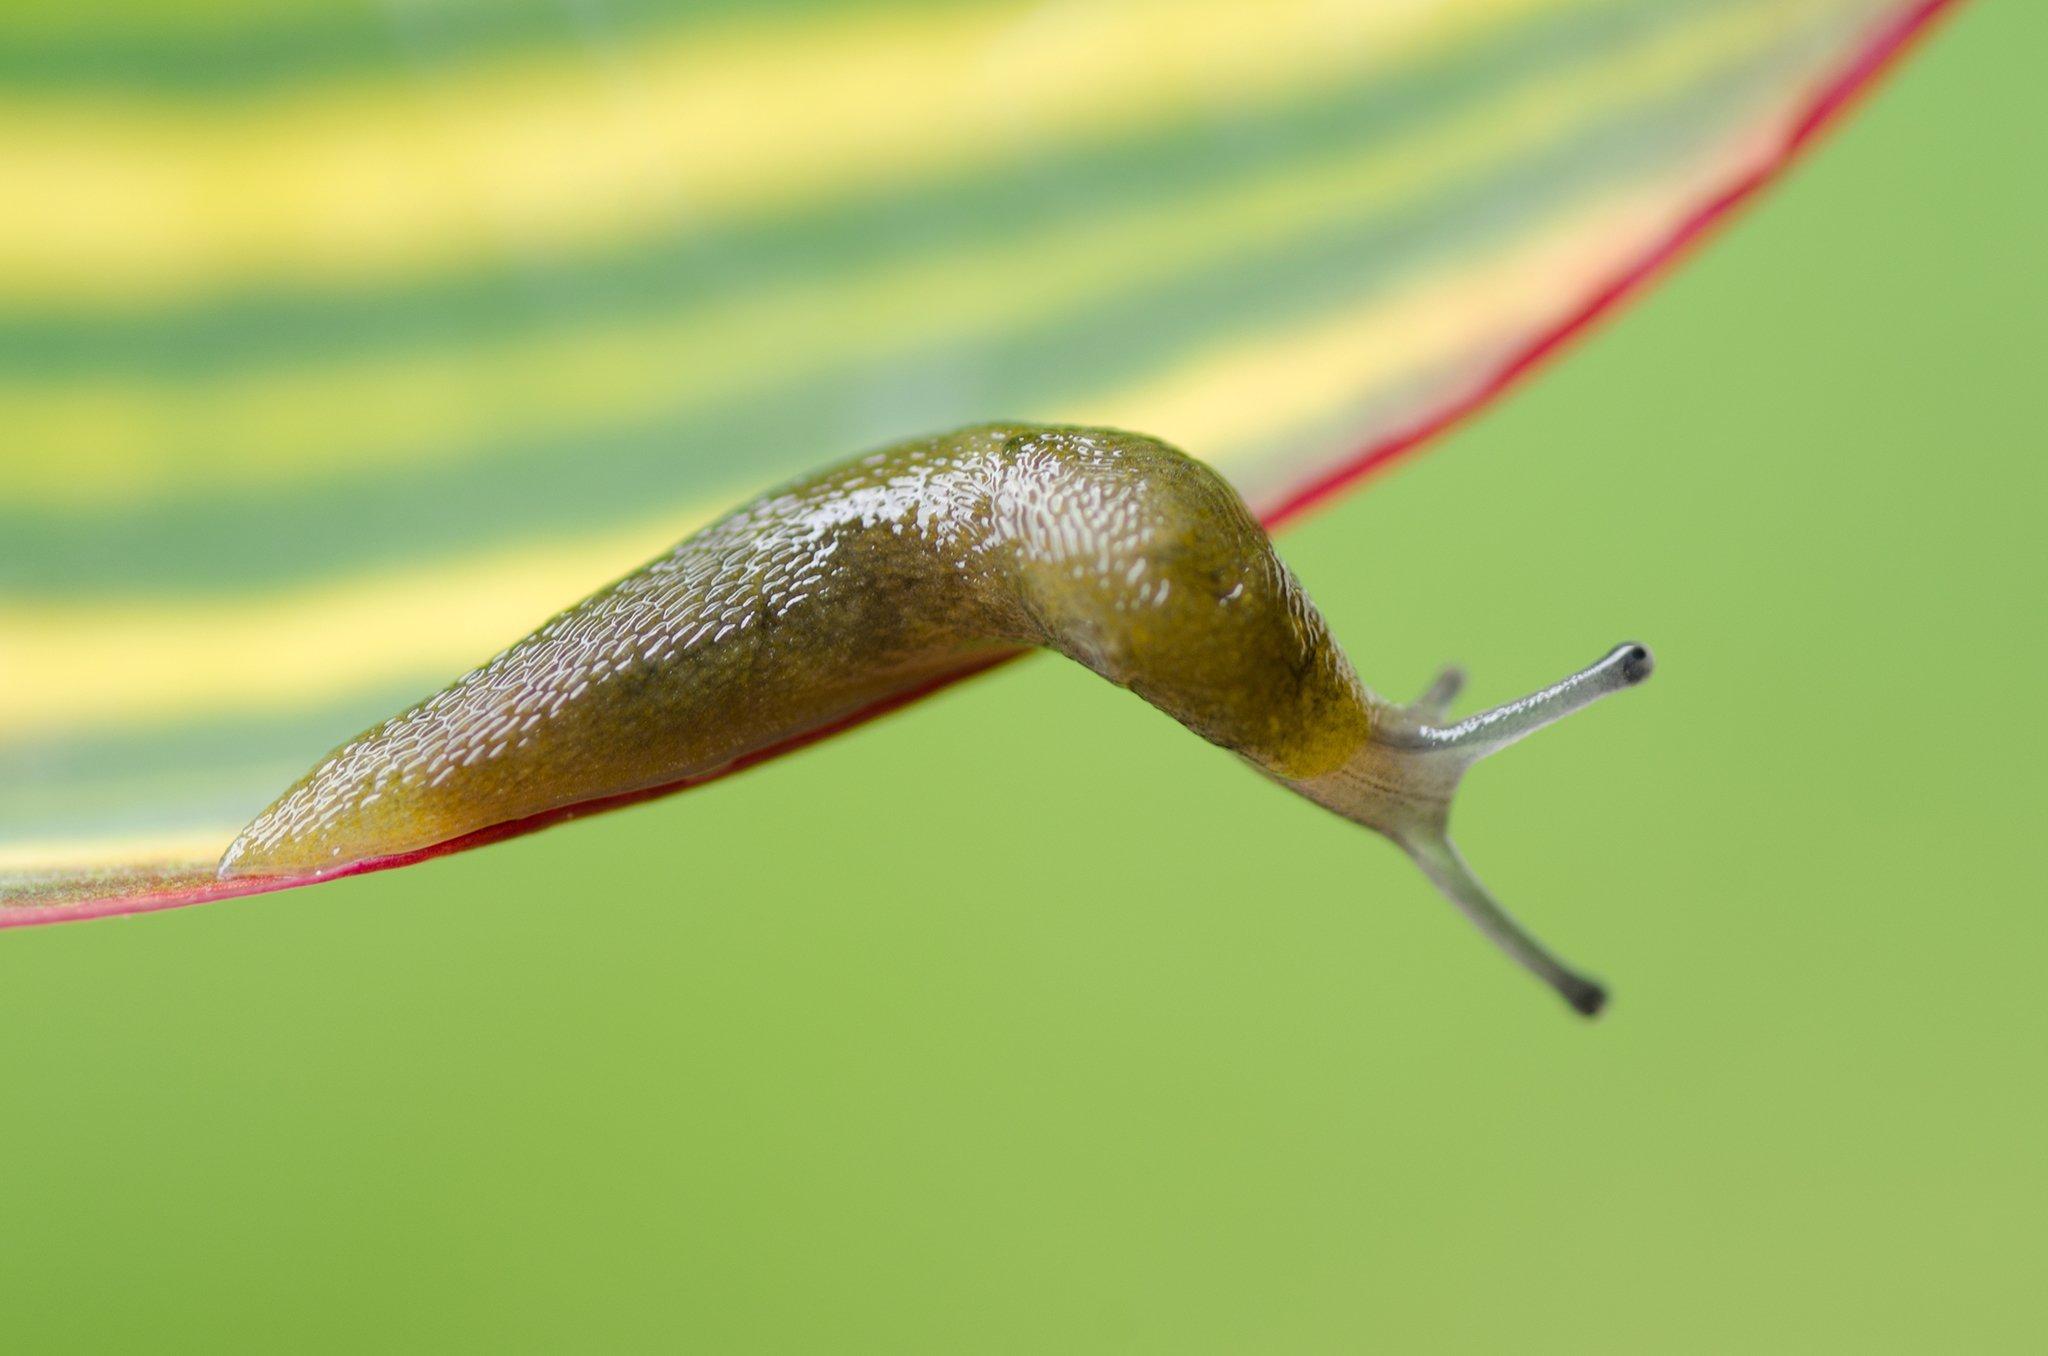 DO NOT REUSE A slug is shown in a file image. (Credit: Achille Salerni/Eyem/Getty Image)